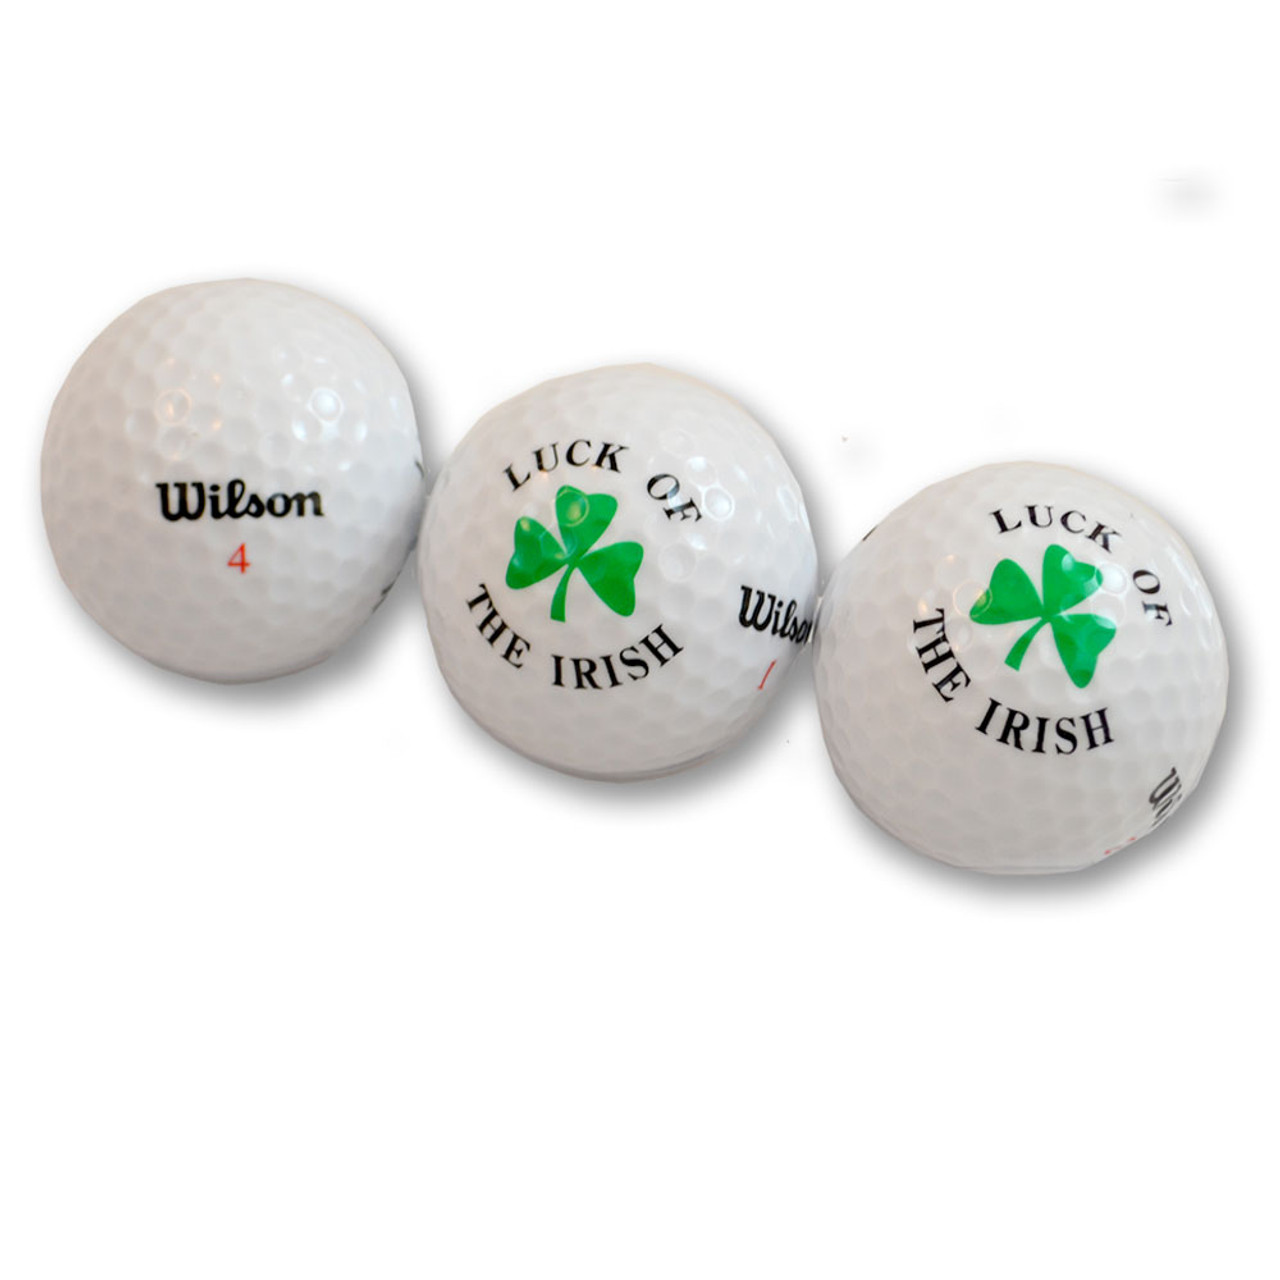 Lucky Irish Golf Balls